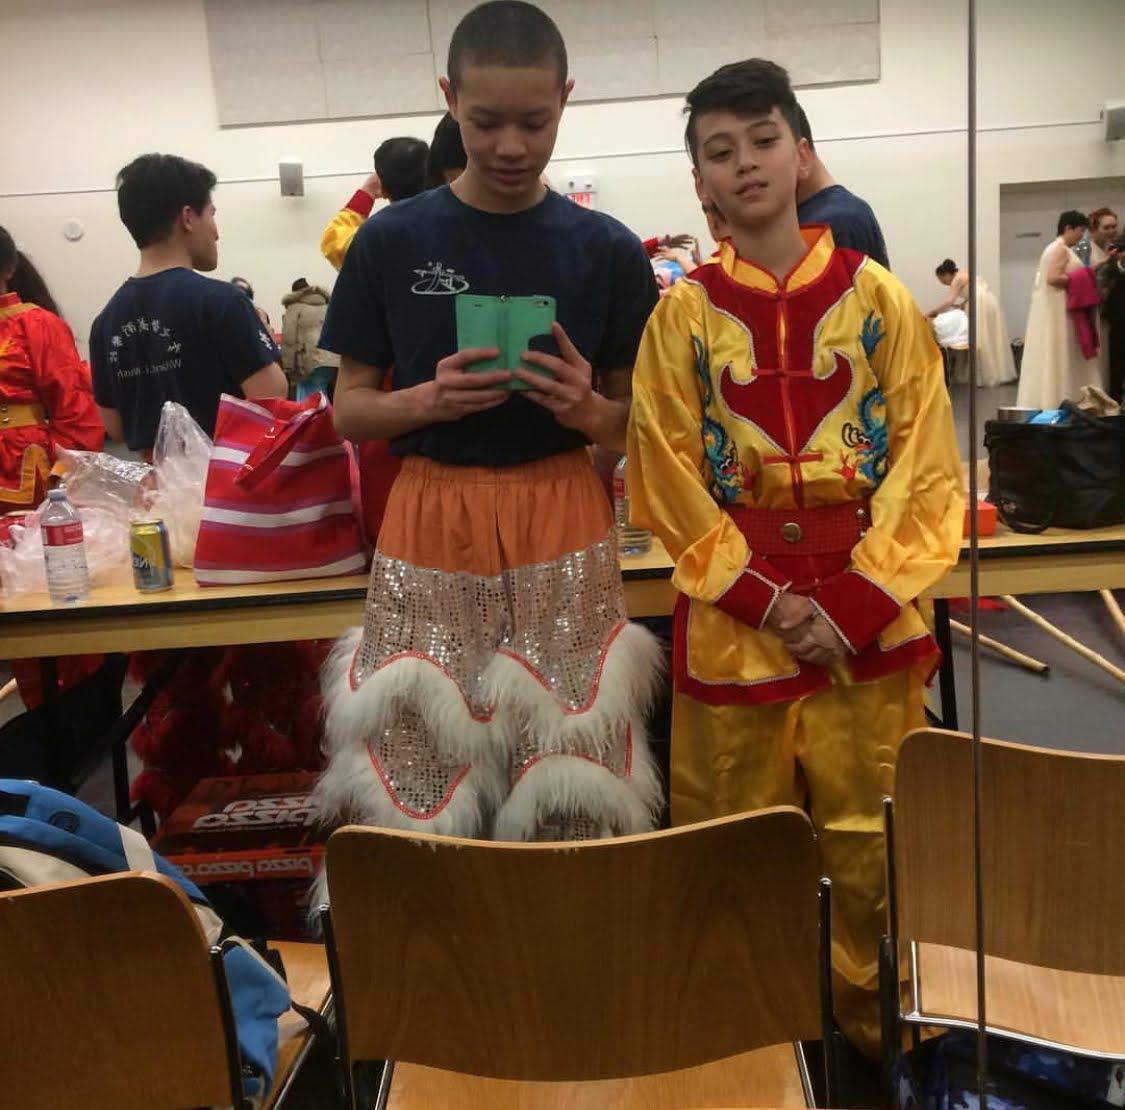 wayland-li-wushu-sony-centre-spring-festival-2018-gala-toronto-canada-16.jpg